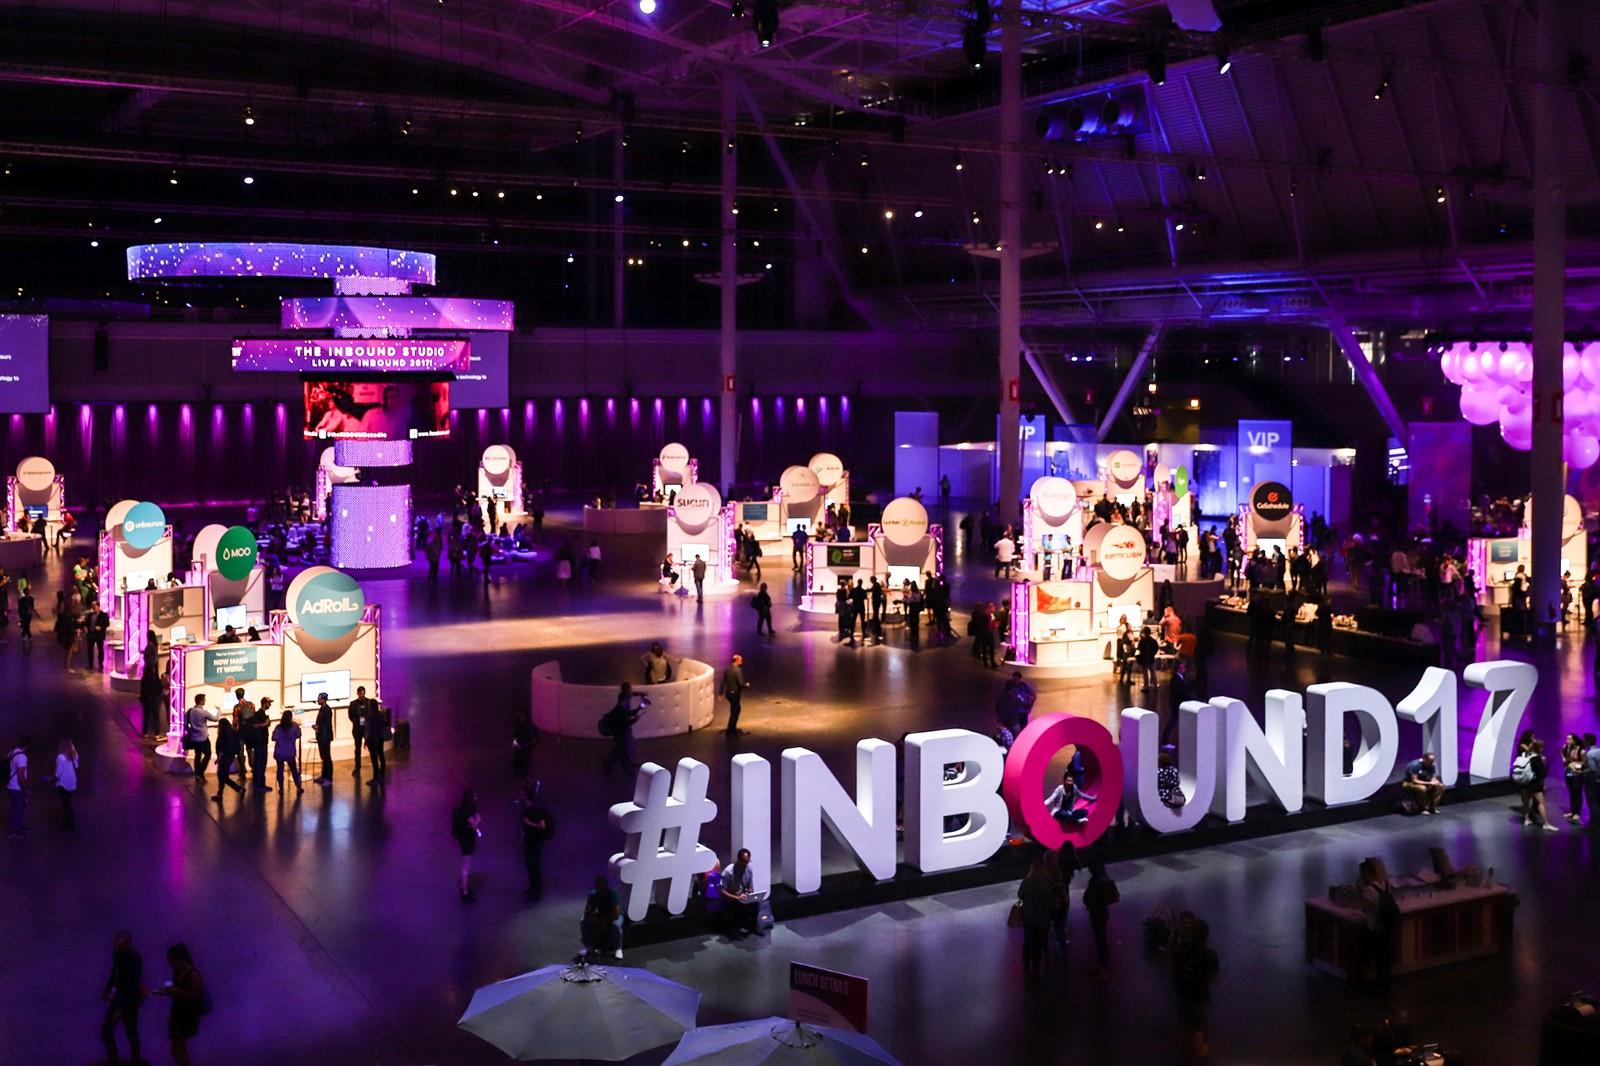 INBOUND 2017 conference